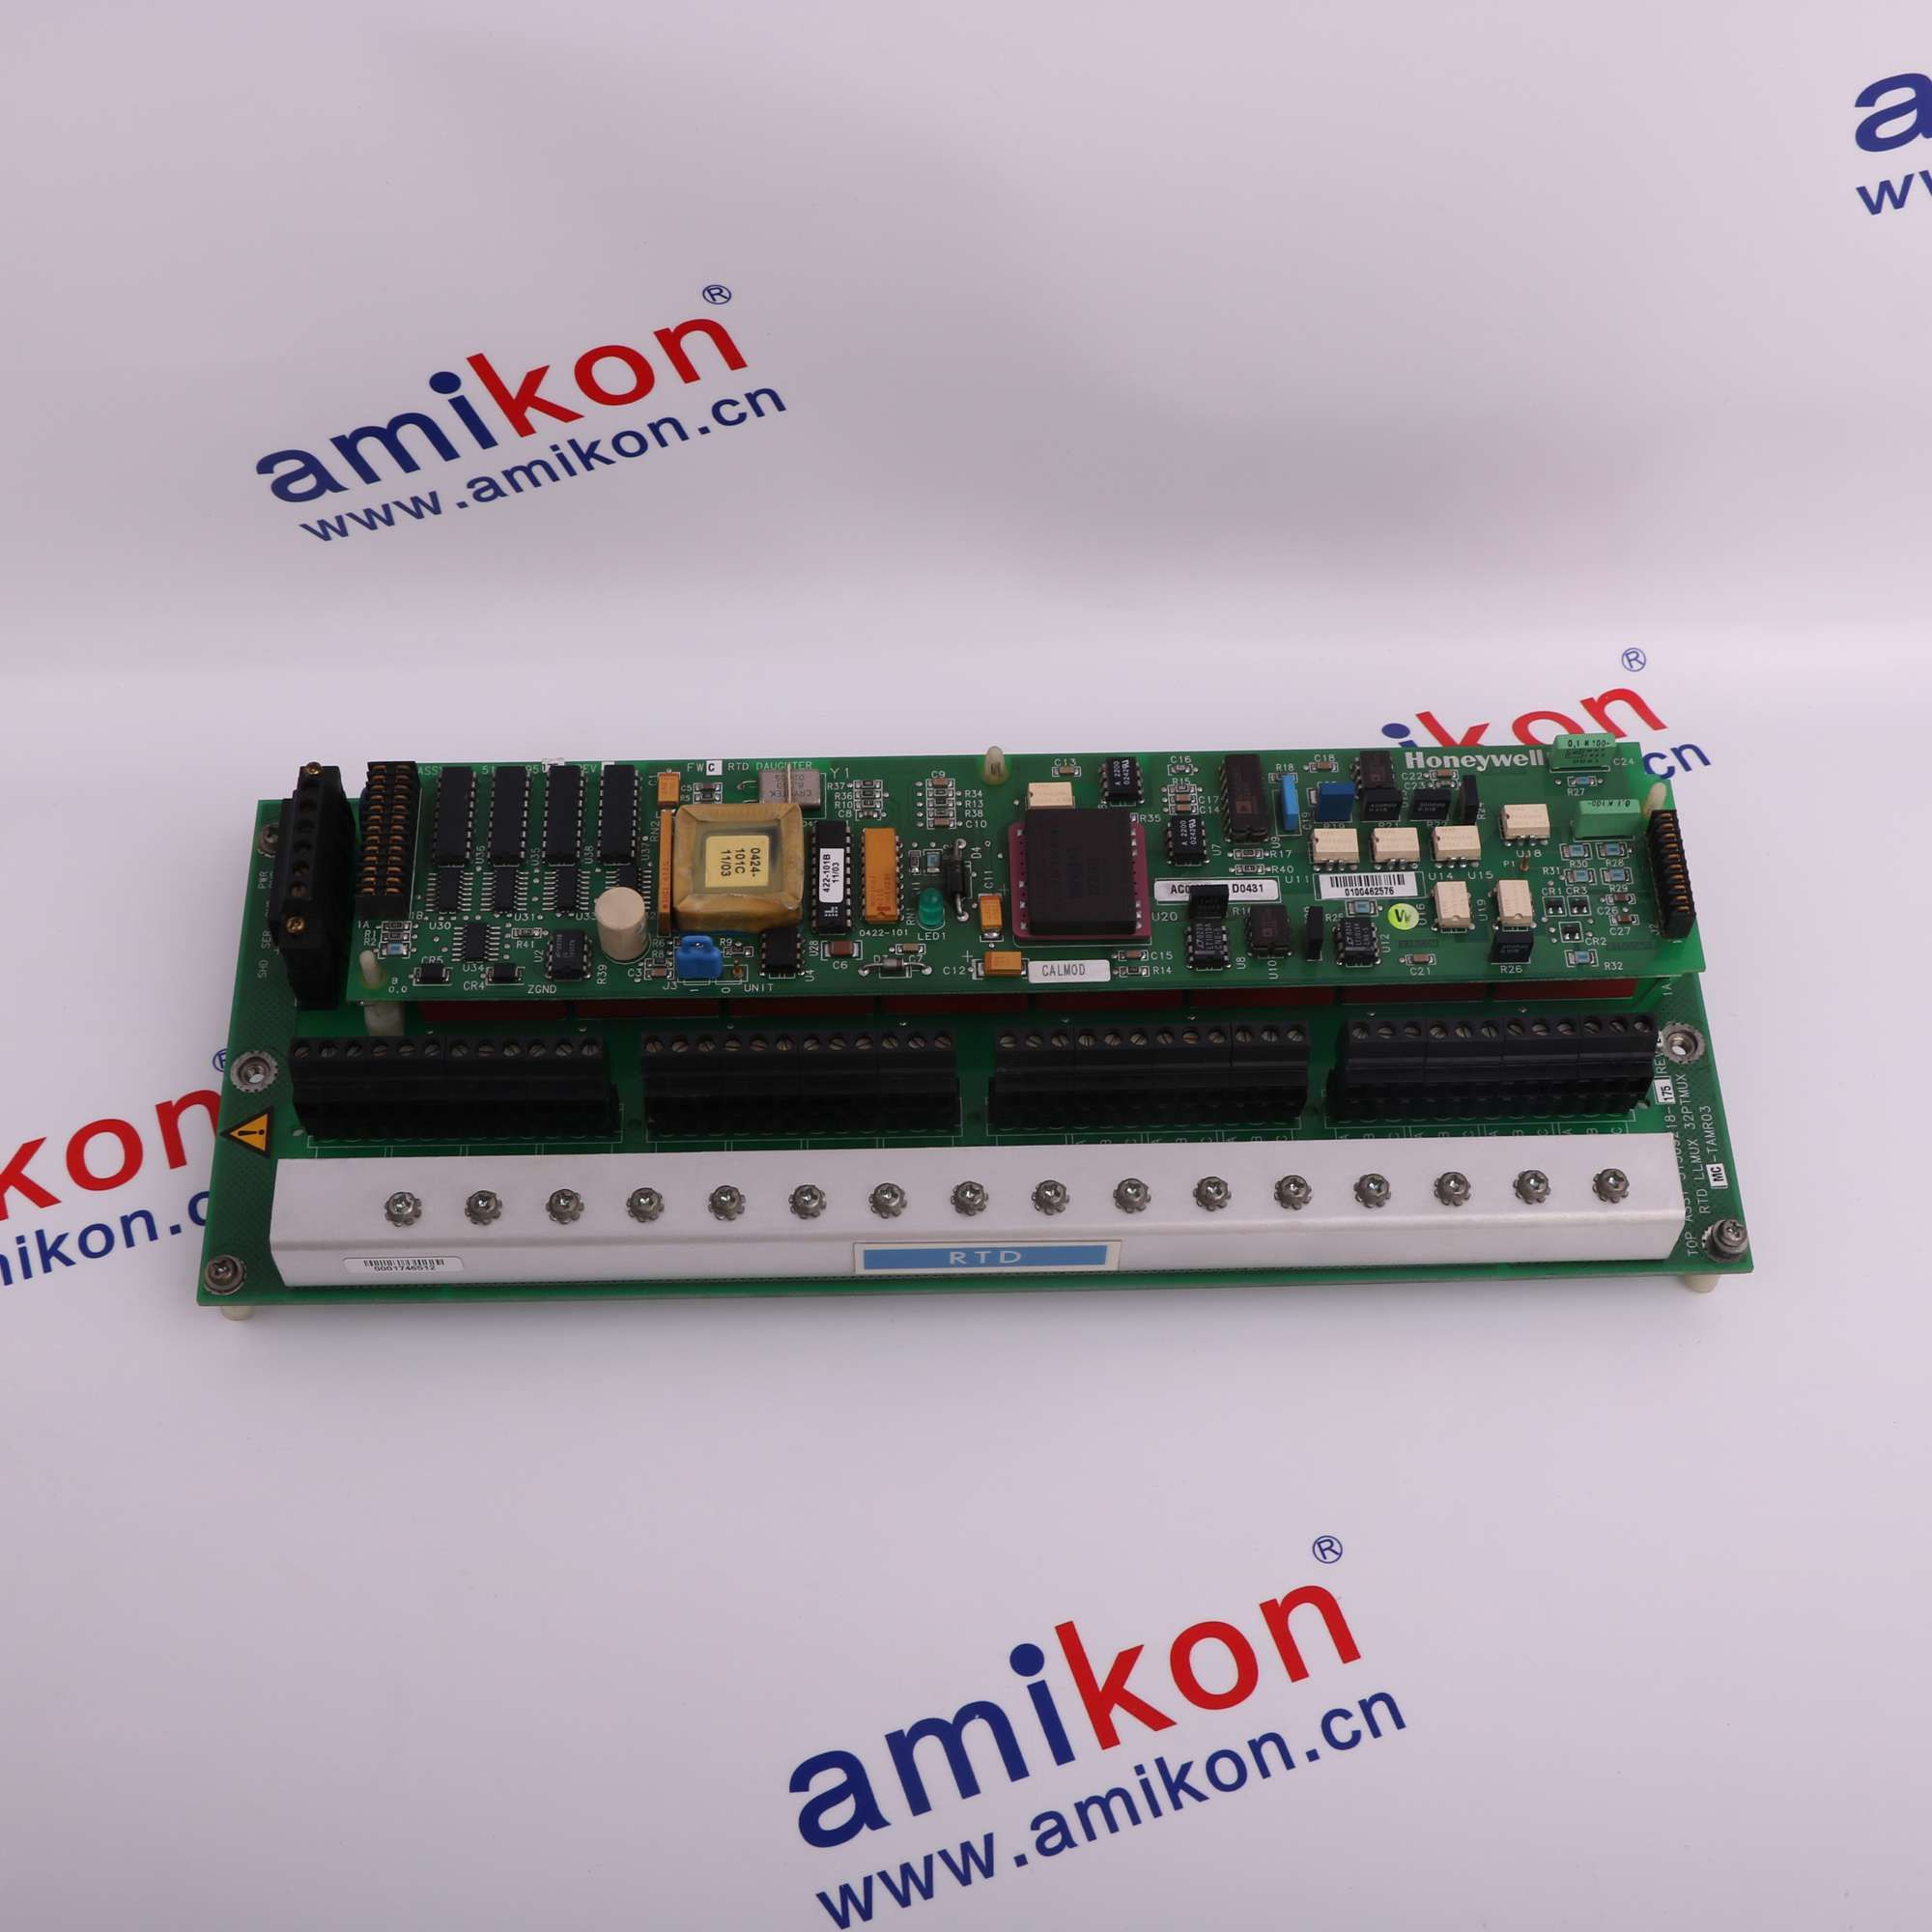 HoneywellCC-TAIX01 || Email: sales3@amikon.cn